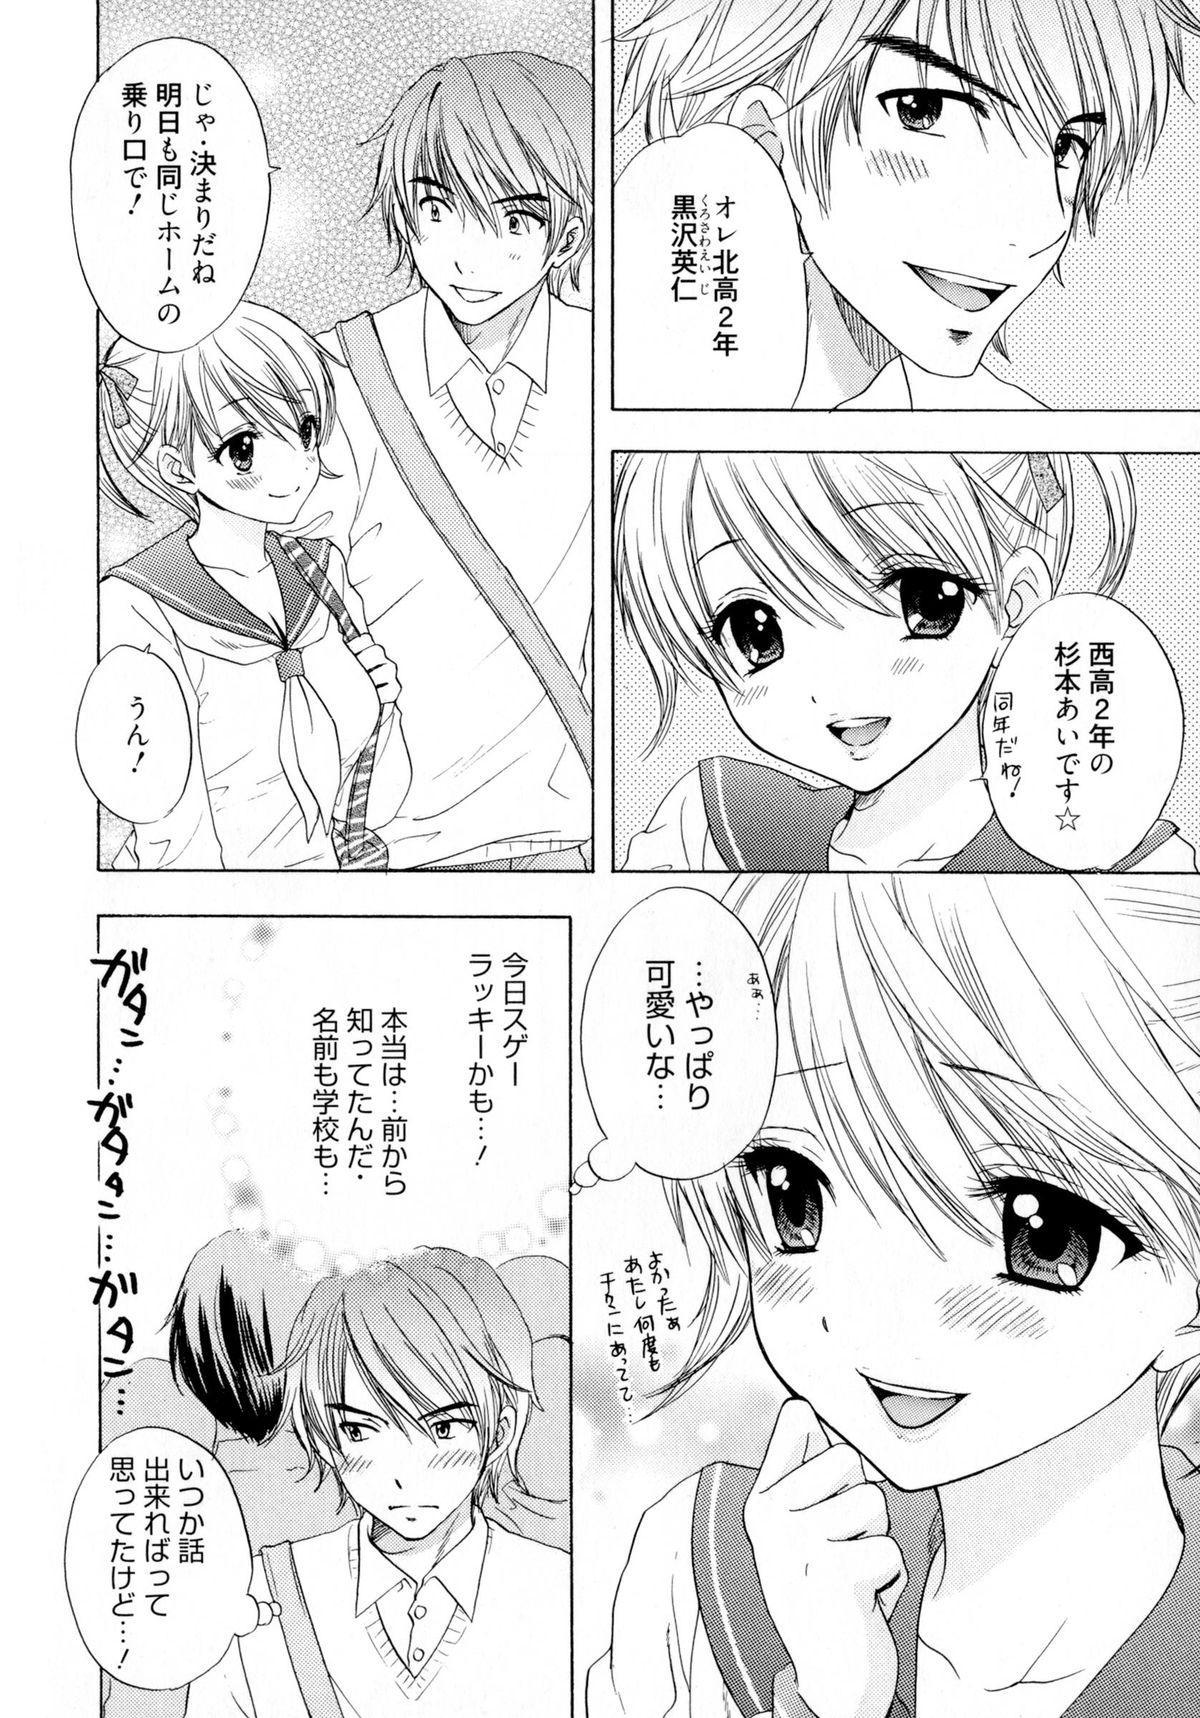 The Great Escape 4 Shokai Genteiban 59